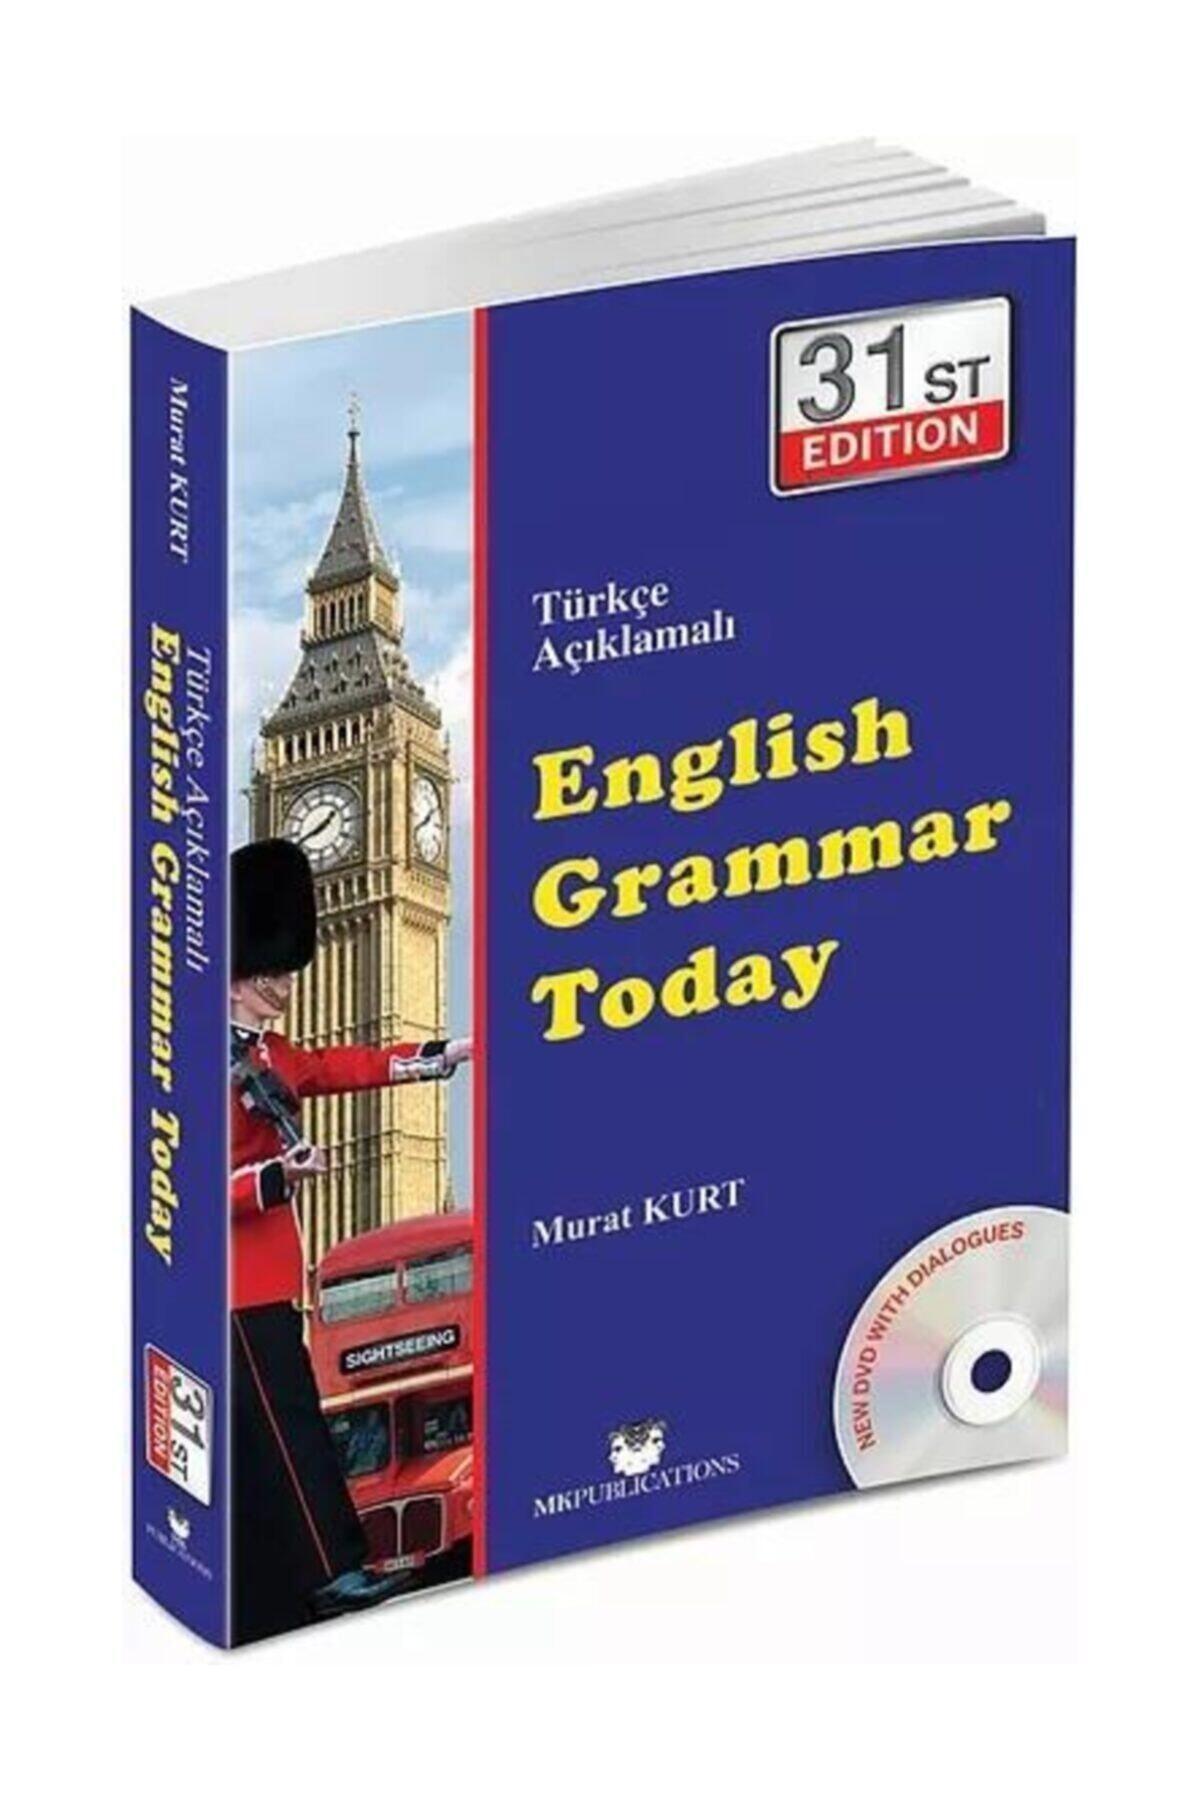 MK Publications English Grammar Today 1